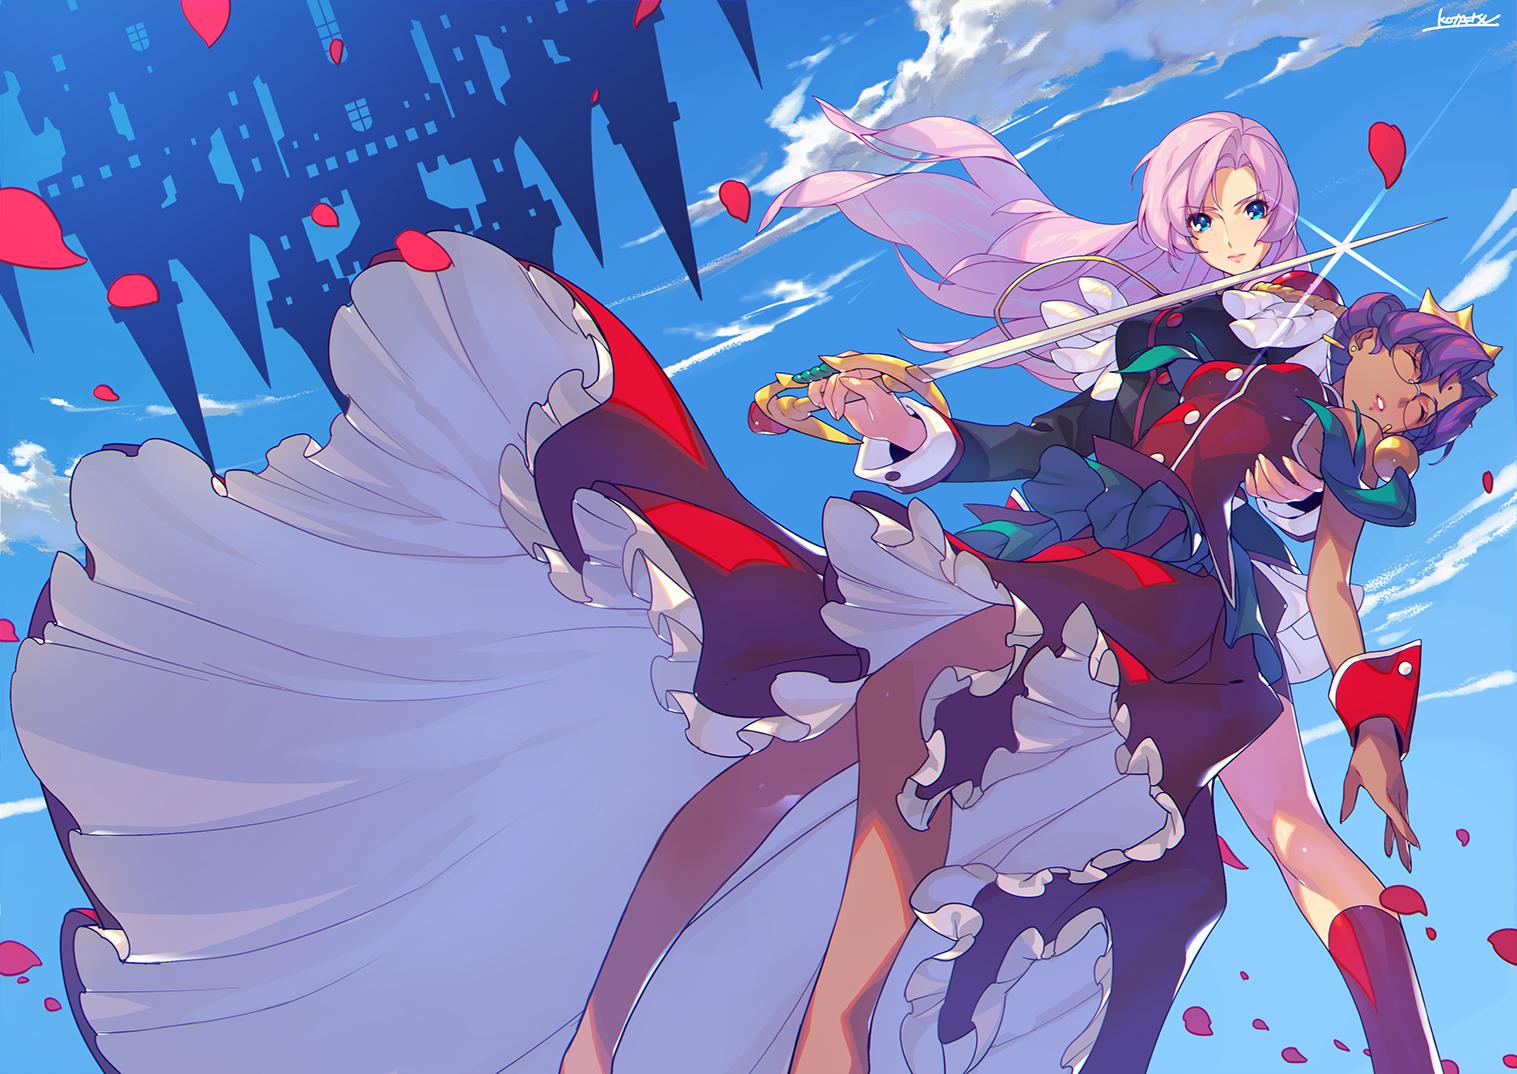 Utena And Anthy Utena Revolutionary Girl Utena Anime Sketch